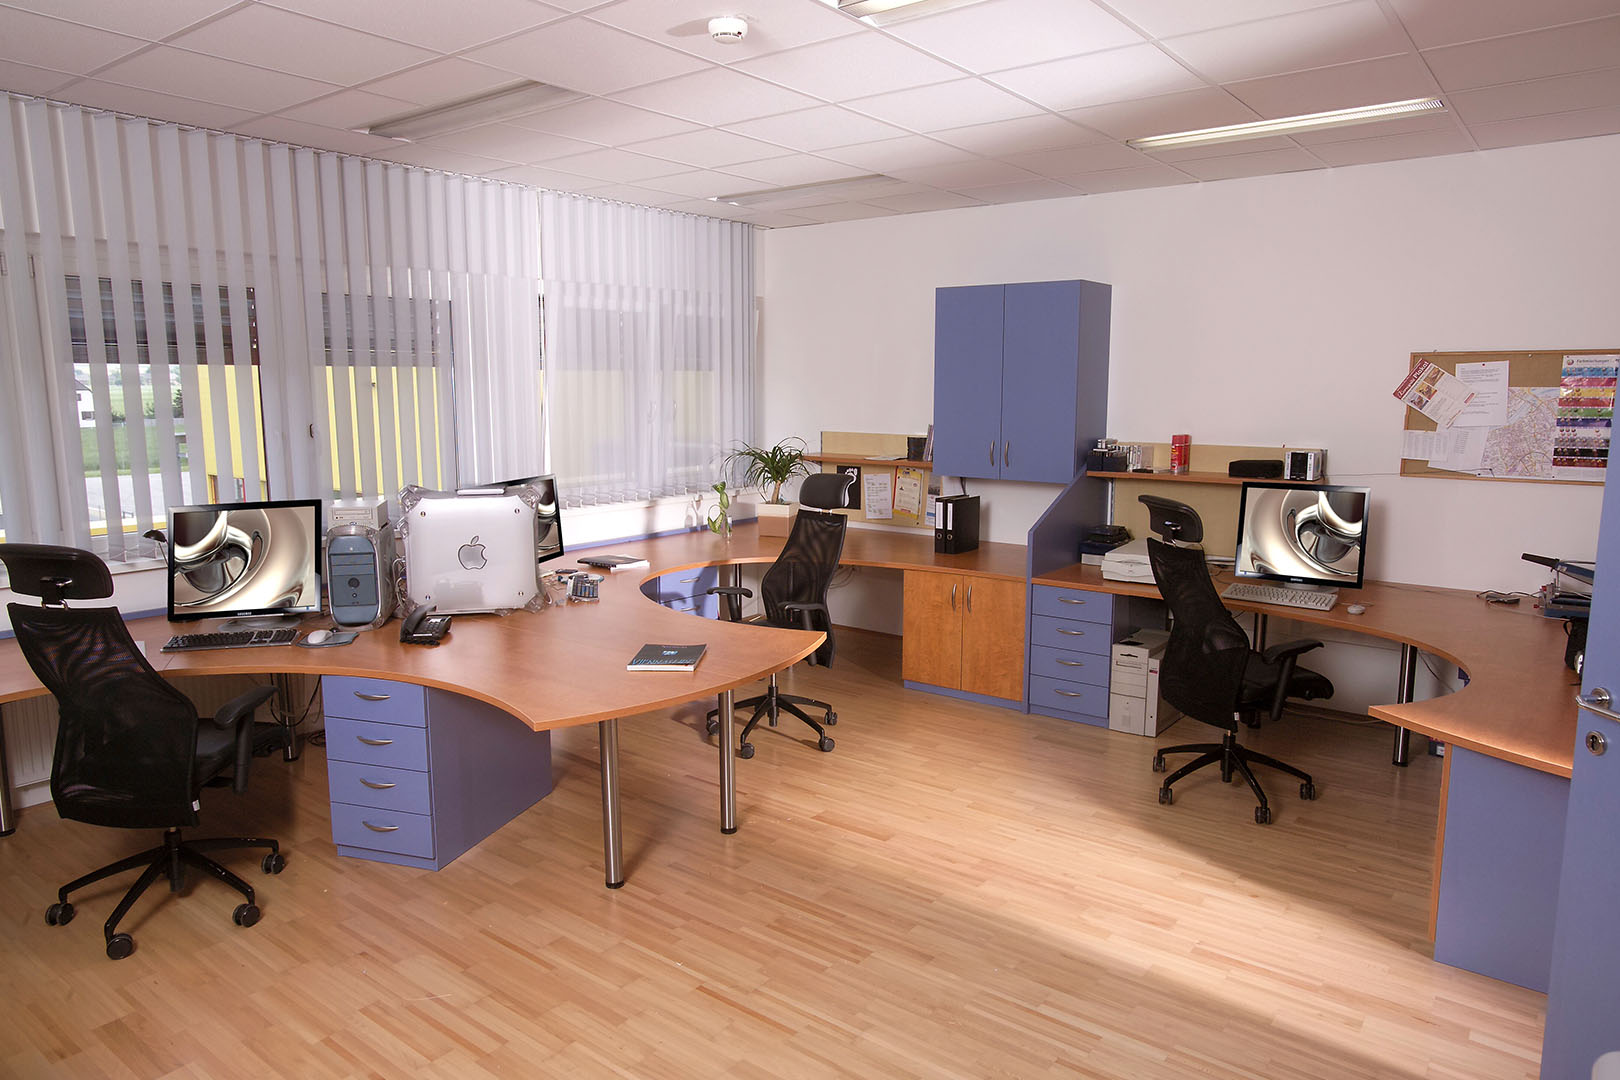 b ro shop design ideenpavillon